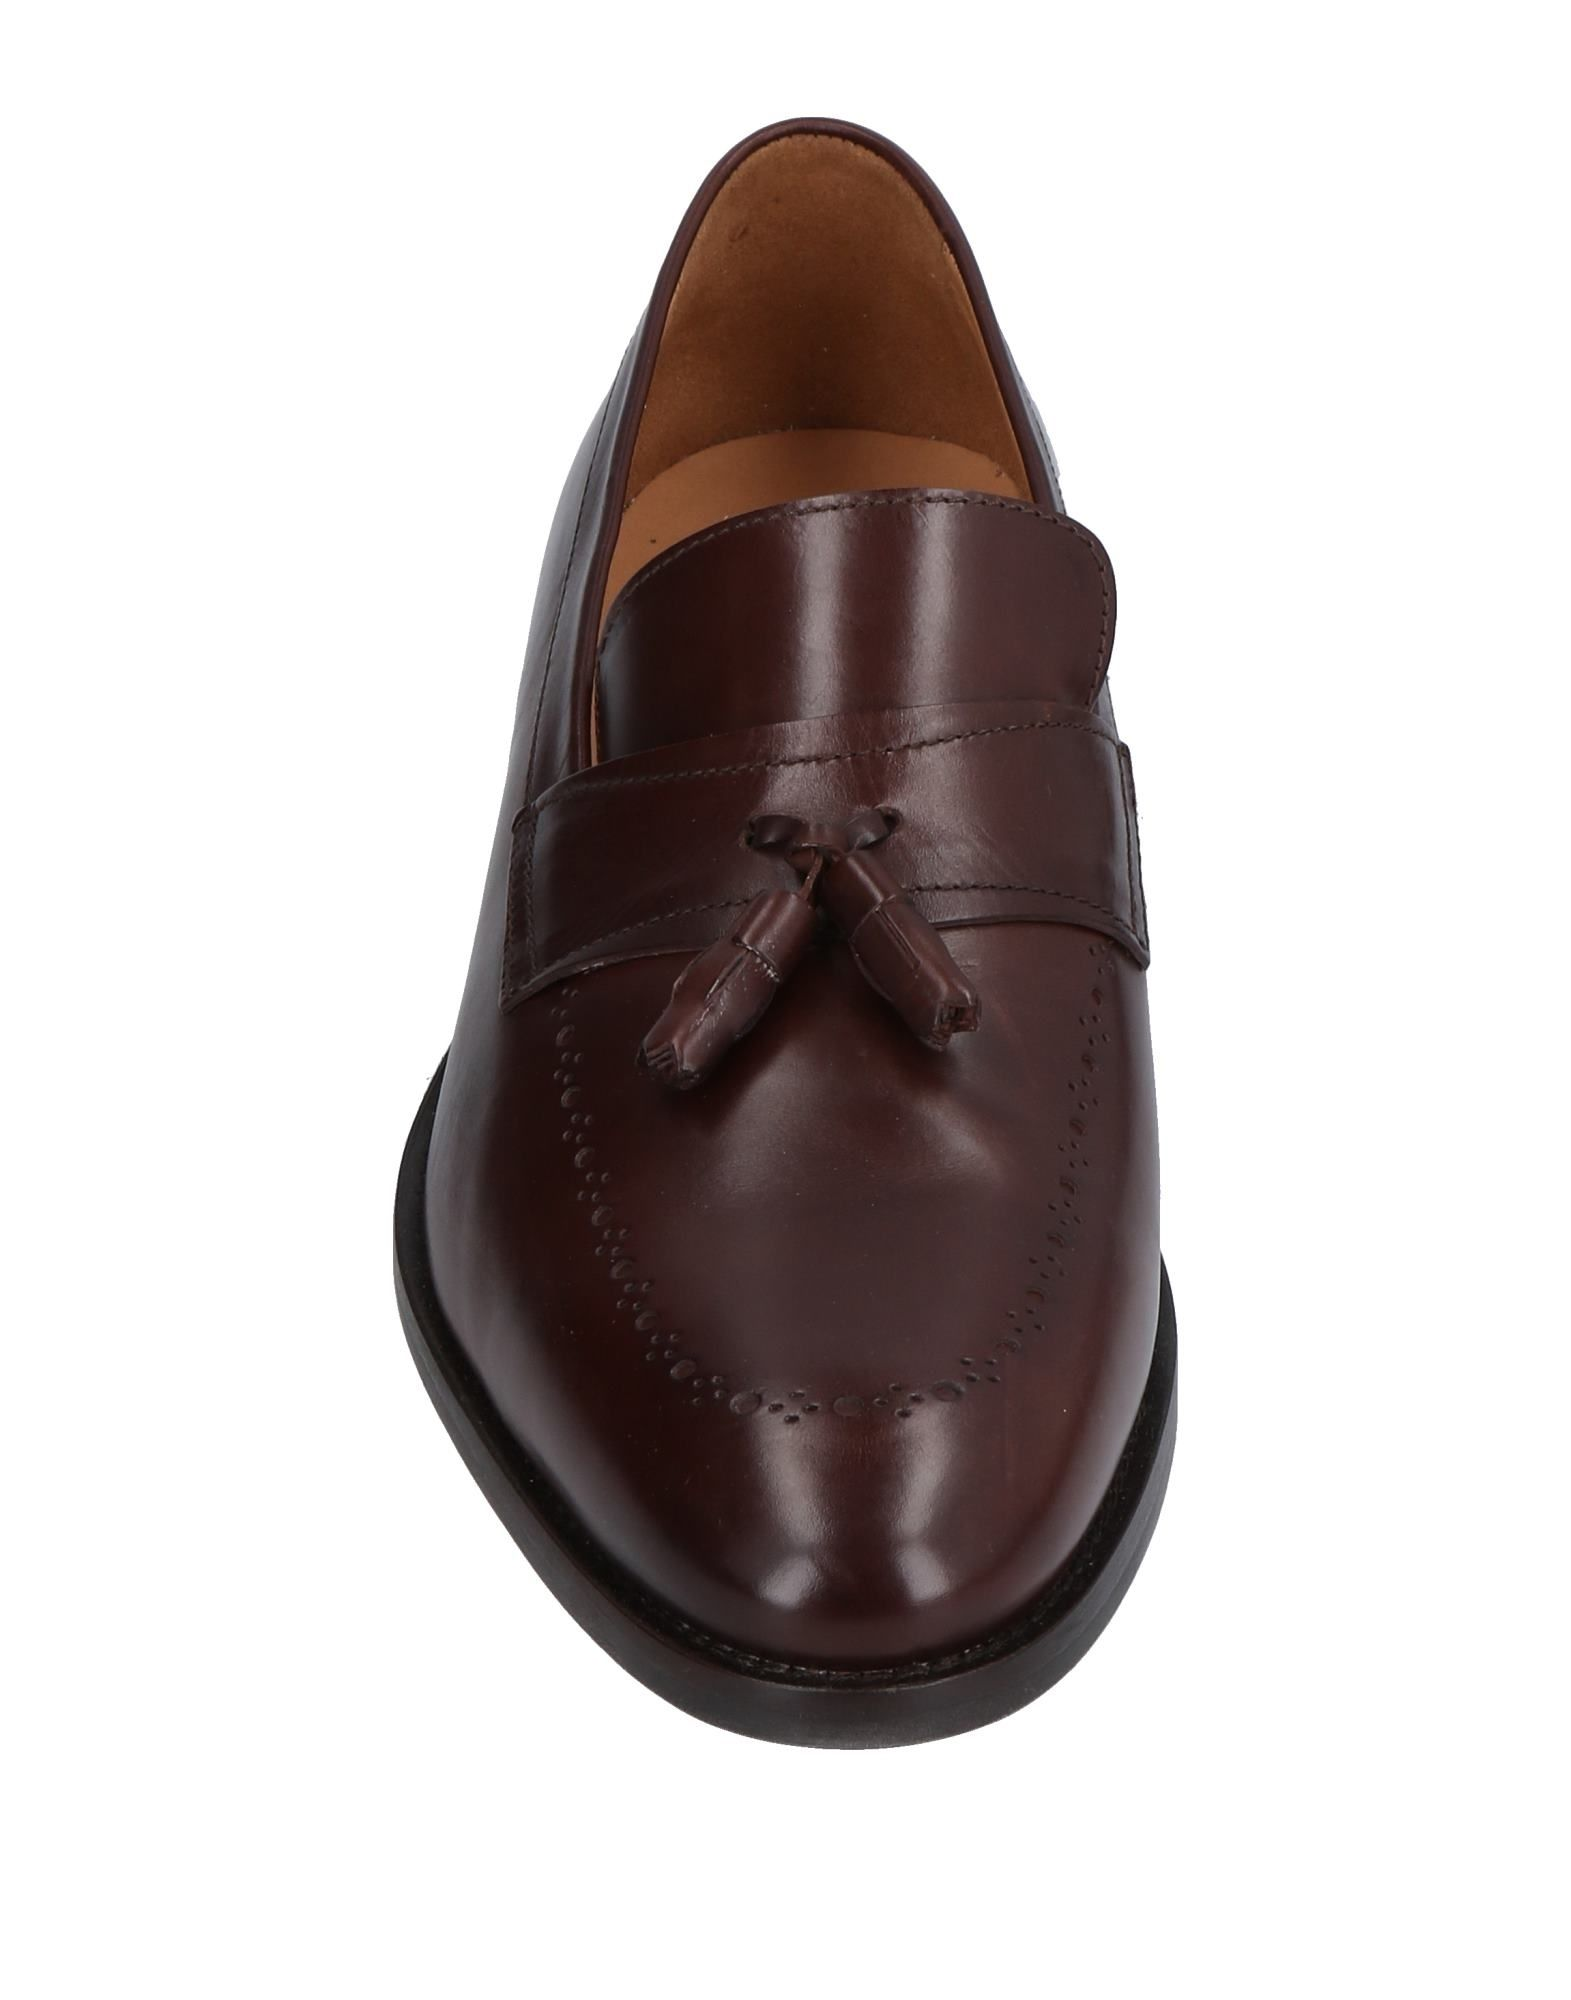 11510892JW Geox Mokassins Herren  11510892JW  Heiße Schuhe 5ac615